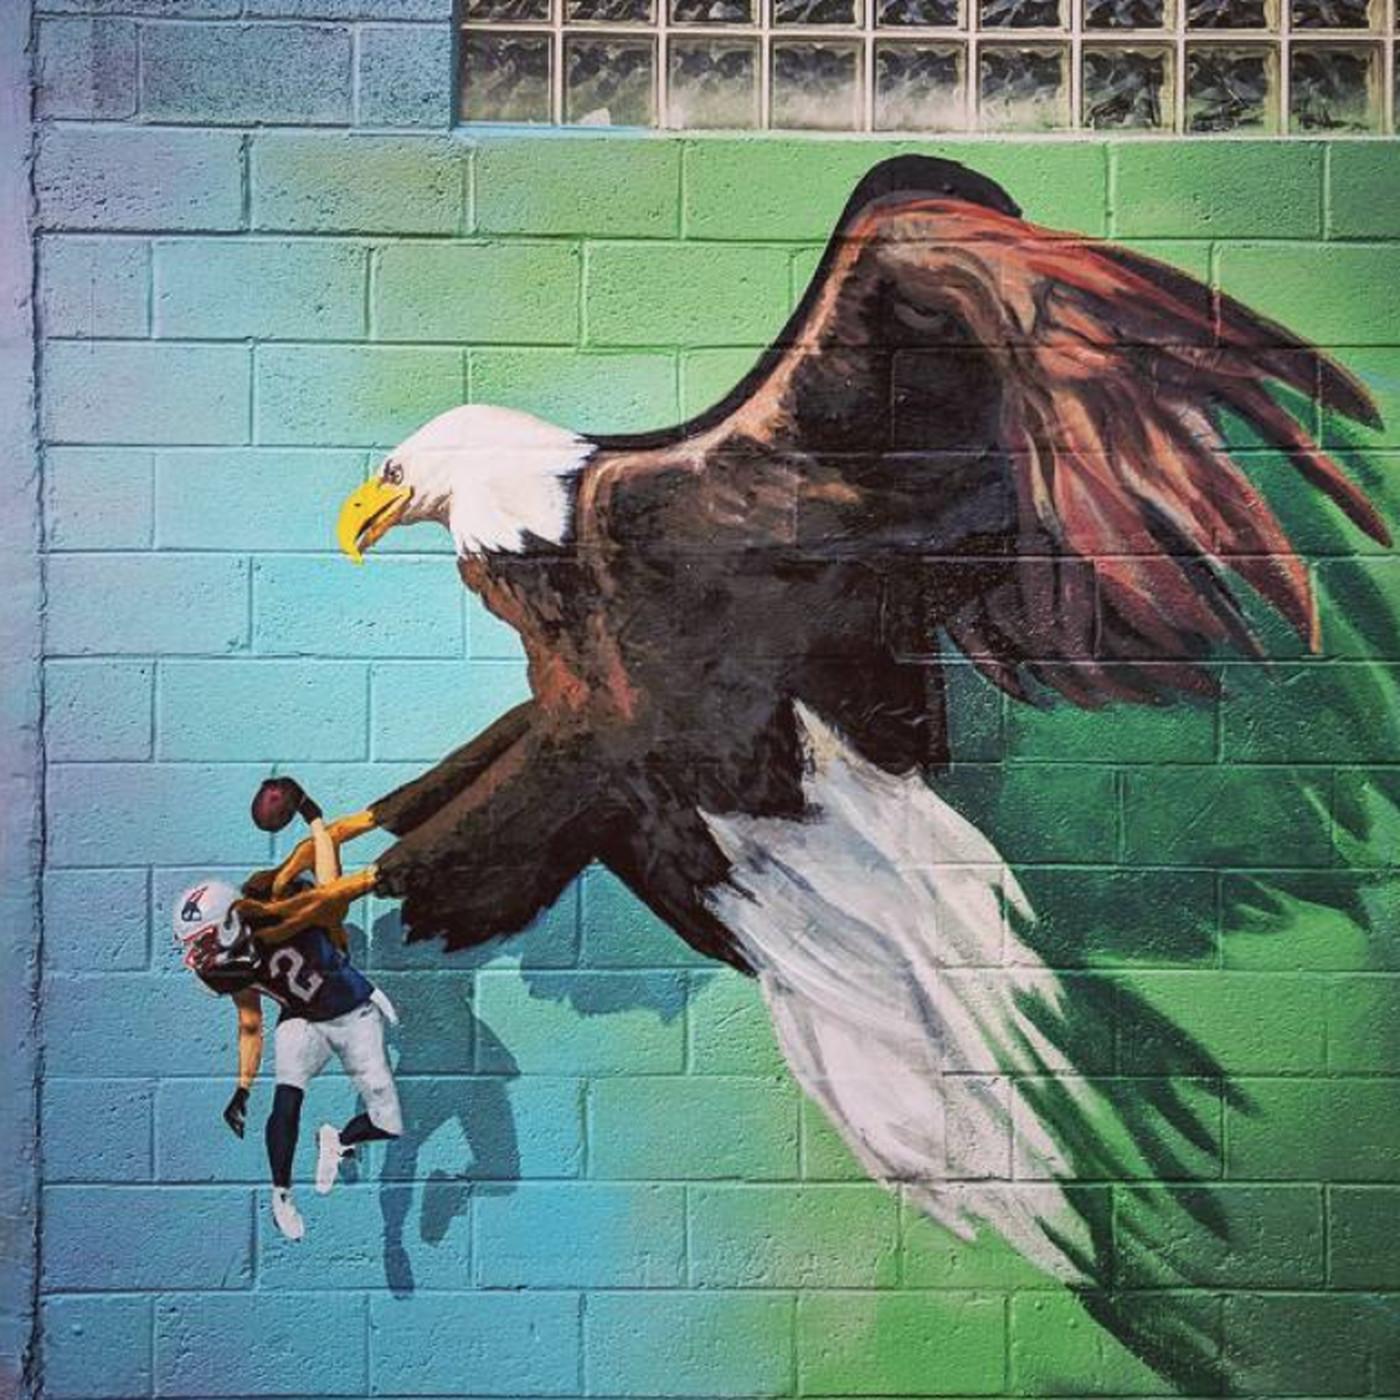 Philly mural of an eagle clipping tom brady wants to become philly mural of an eagle clipping tom brady wants to become permanent curbed philly rubansaba